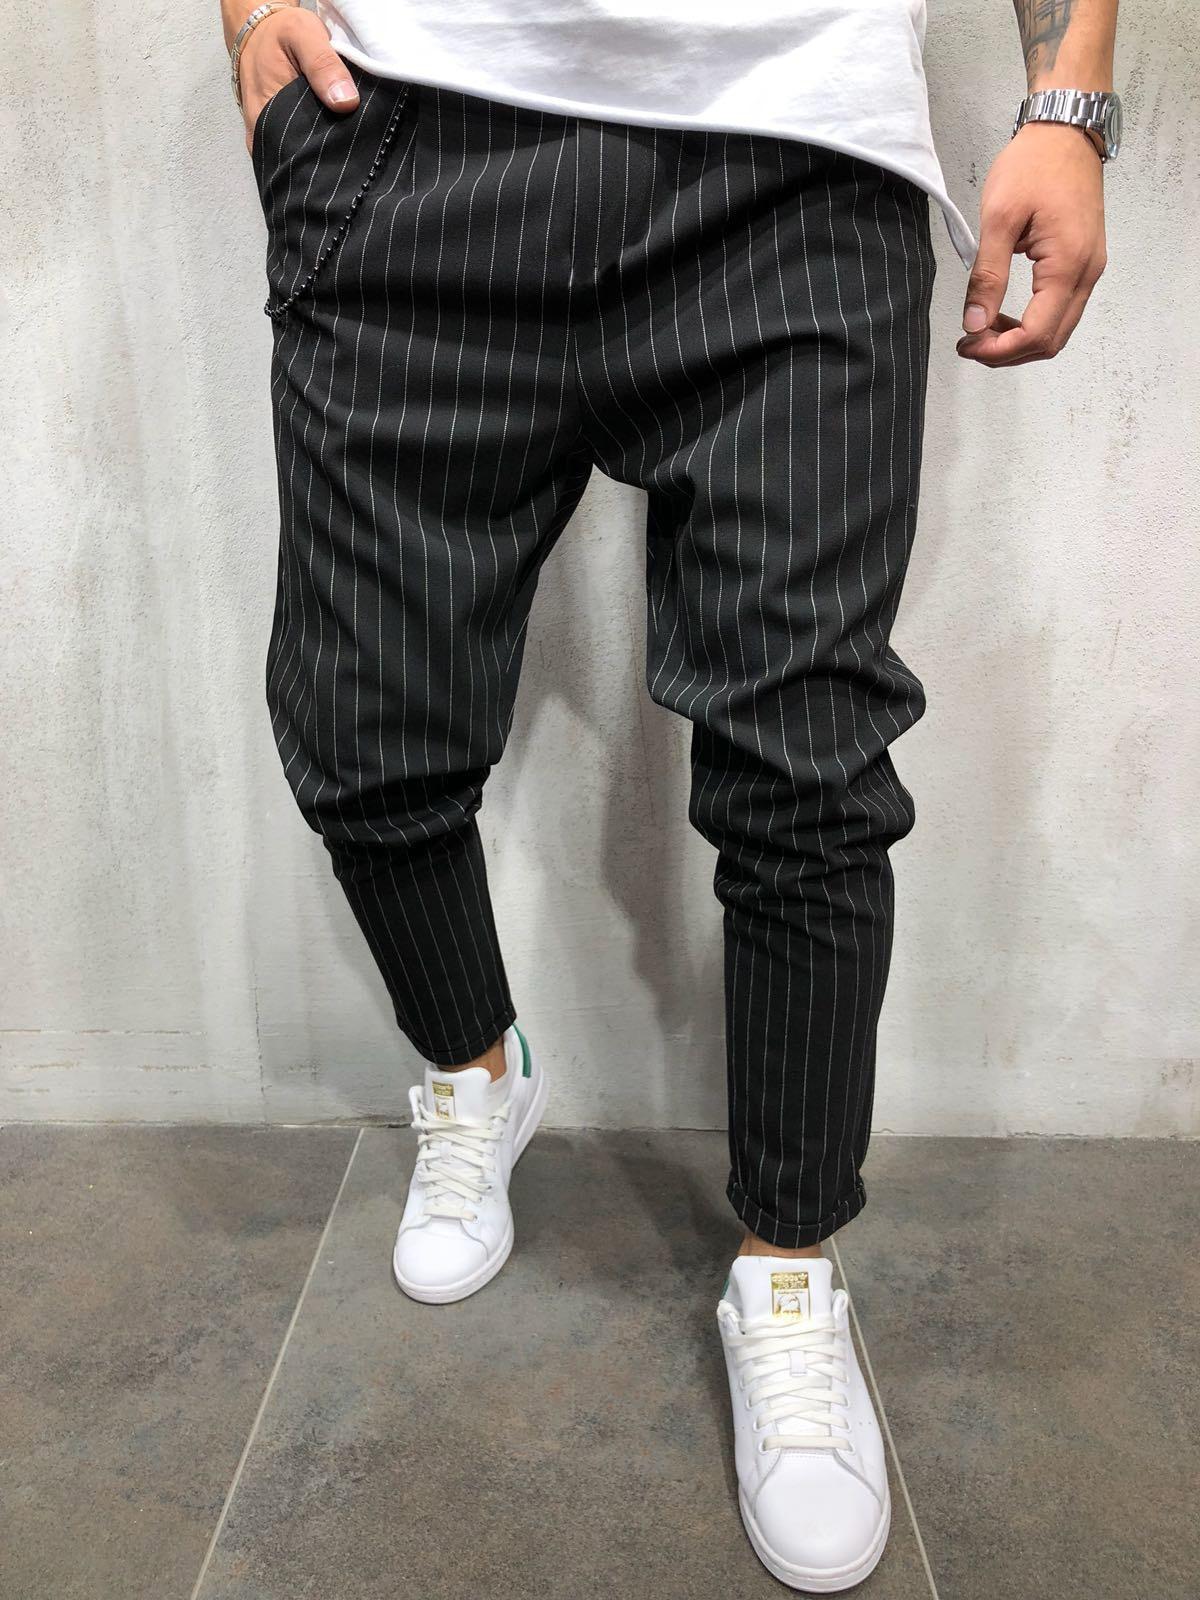 H25d33bbca3a04f04b718ef325c7c85e4L Spring Autumn Casual Men Sweat Pants Male Sportswear Casual Trousers Straight Pants Hip Hop High Street Trousers Pants Joggers